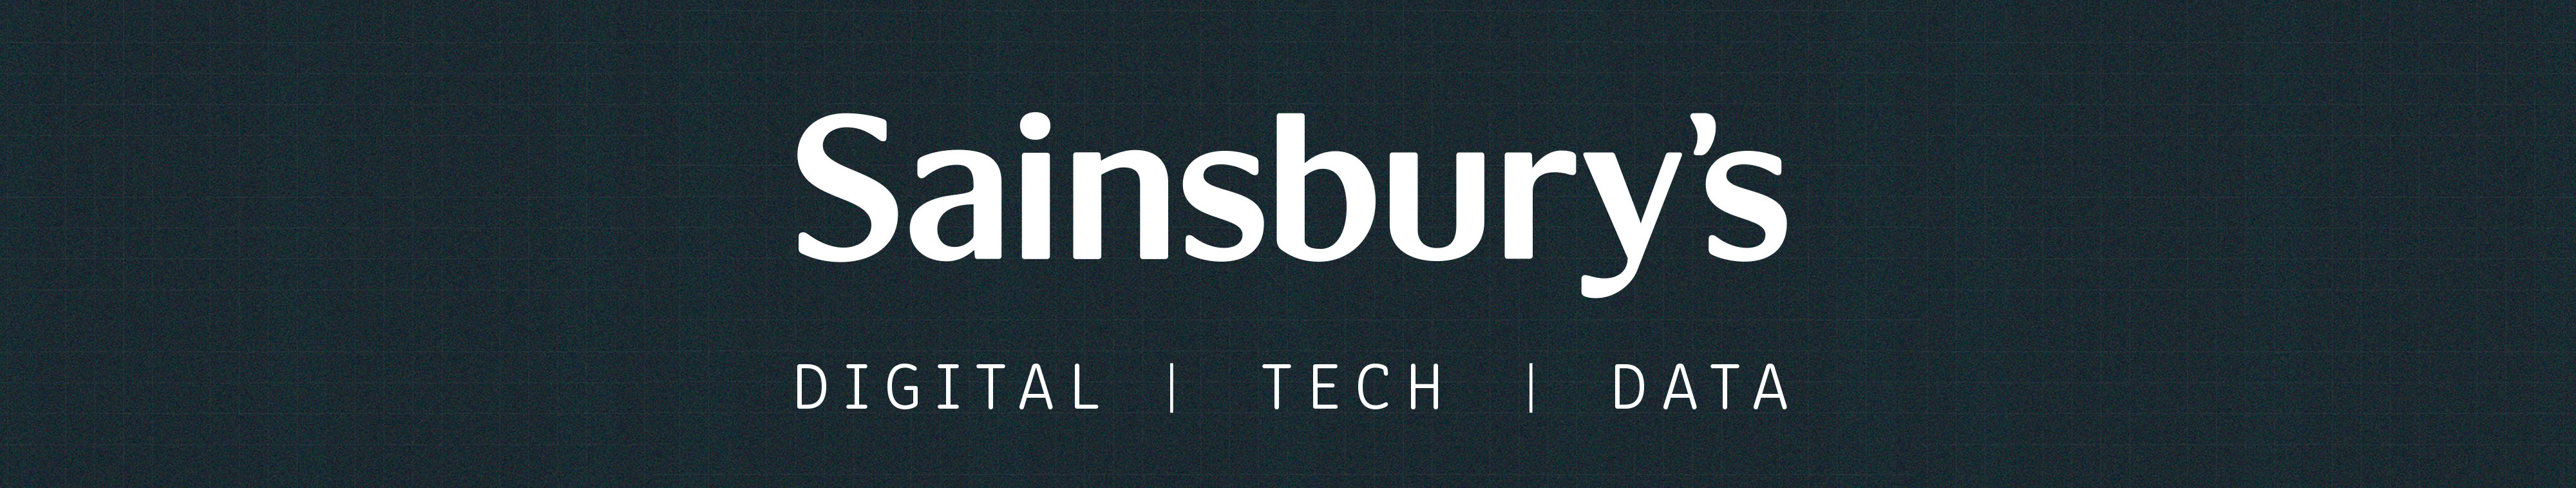 Sainsburys, Data, Tech, Digital